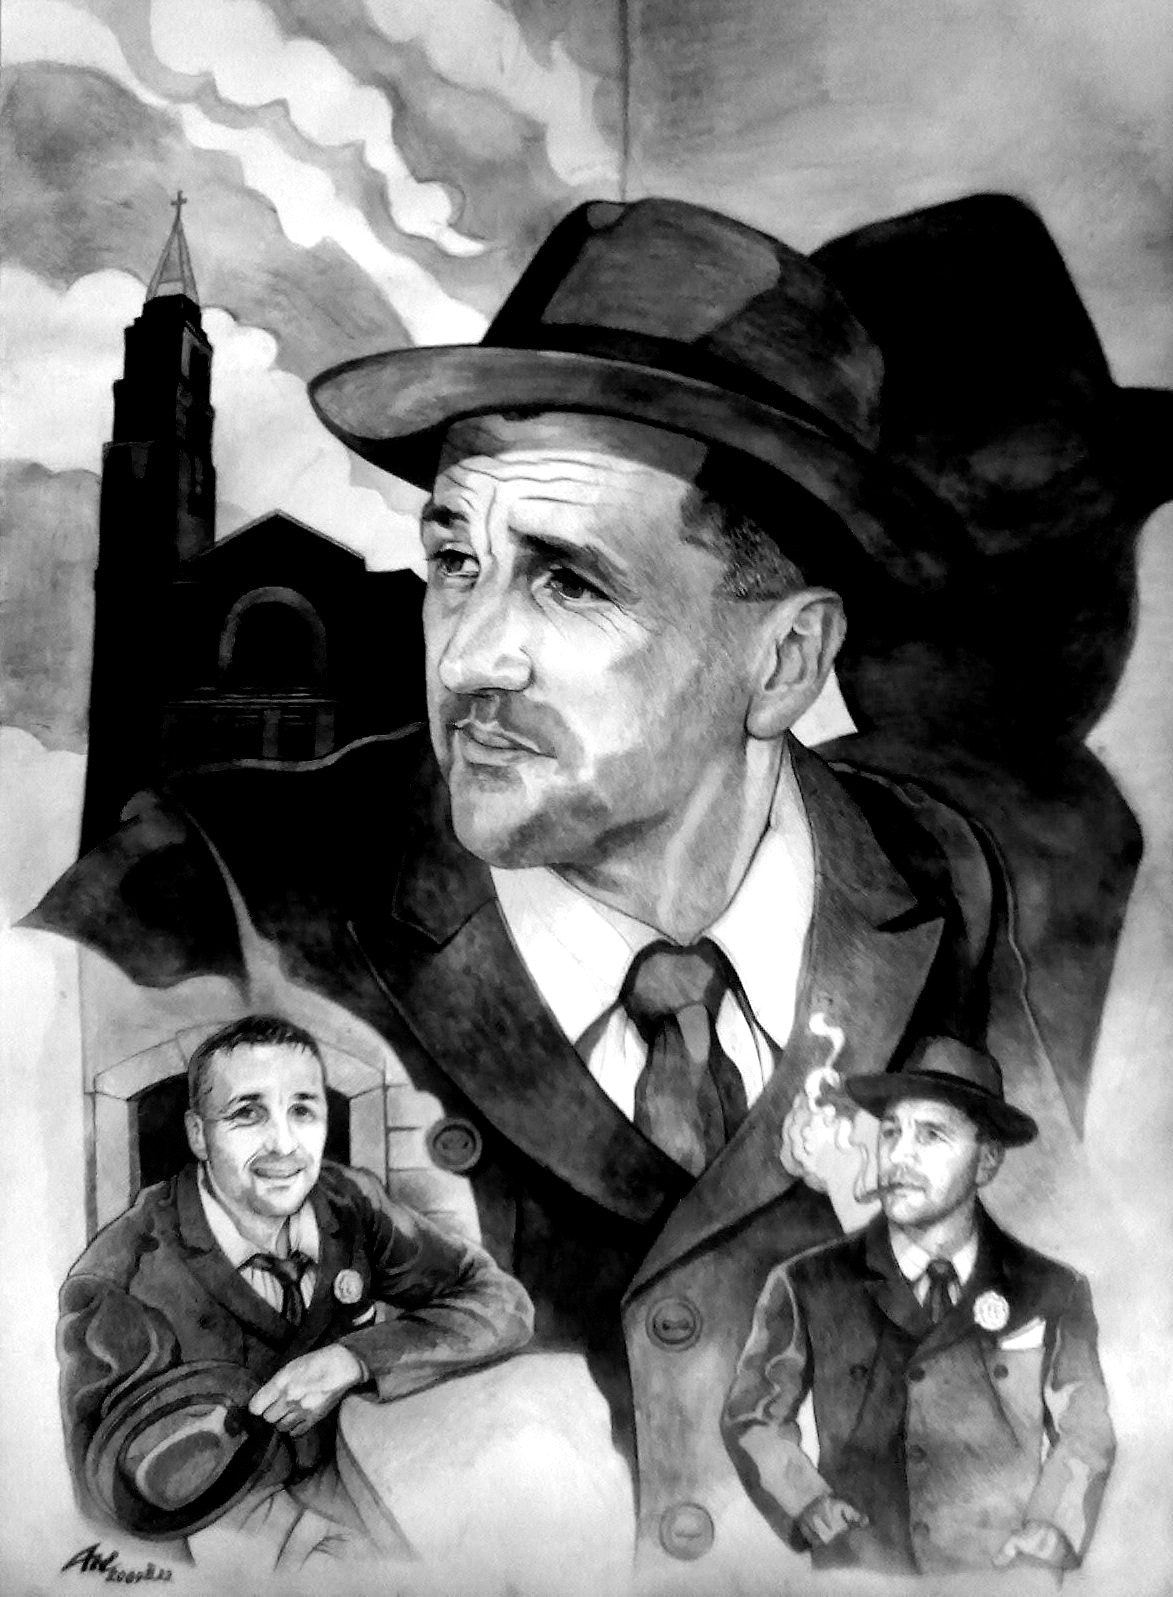 THE GENGRE GANGSTER I - Plakát; Portré, MMIX - Tus, toll, lavírozott tus, karton - 70 X 50 cm.jpg